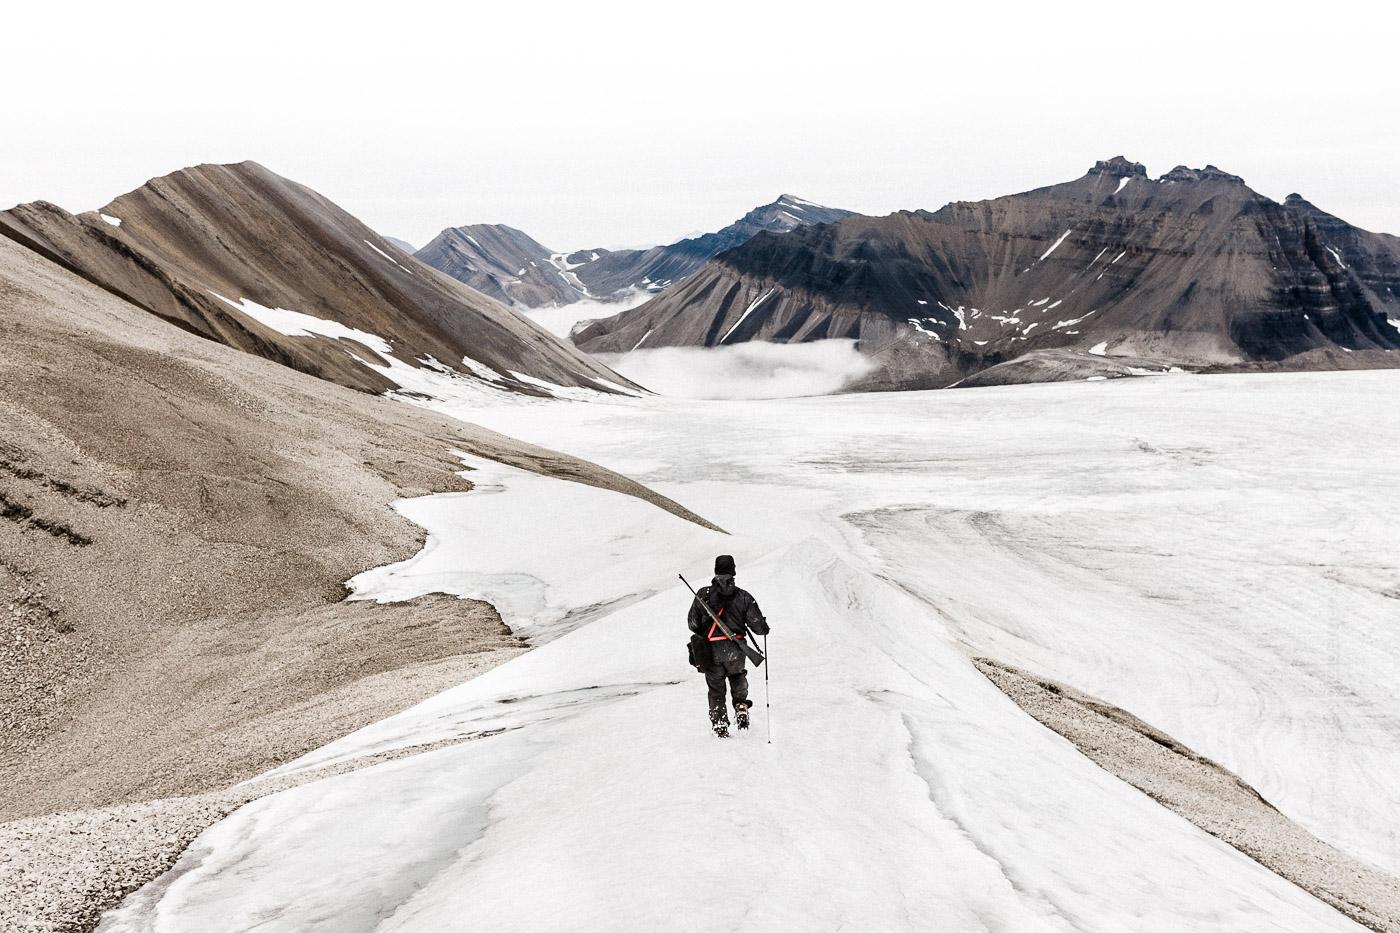 02_land_of_ice_alexanderlembke_de